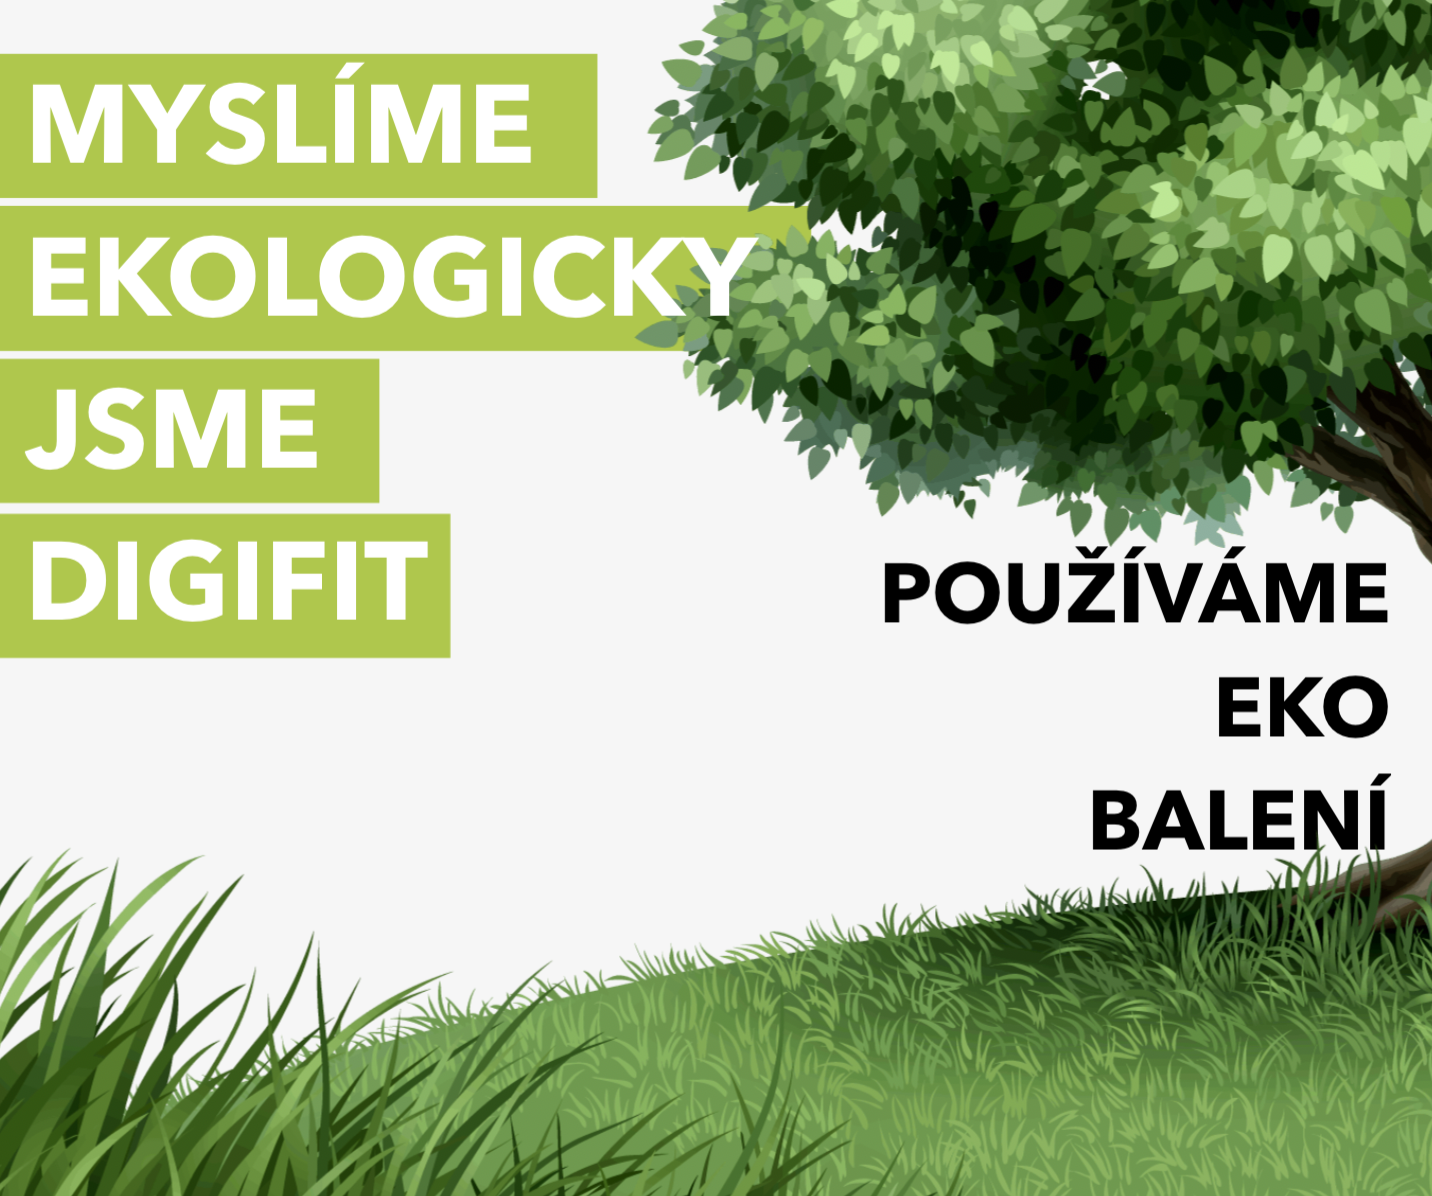 https://www.digifit.cz/blog/jsme-ekologicti/